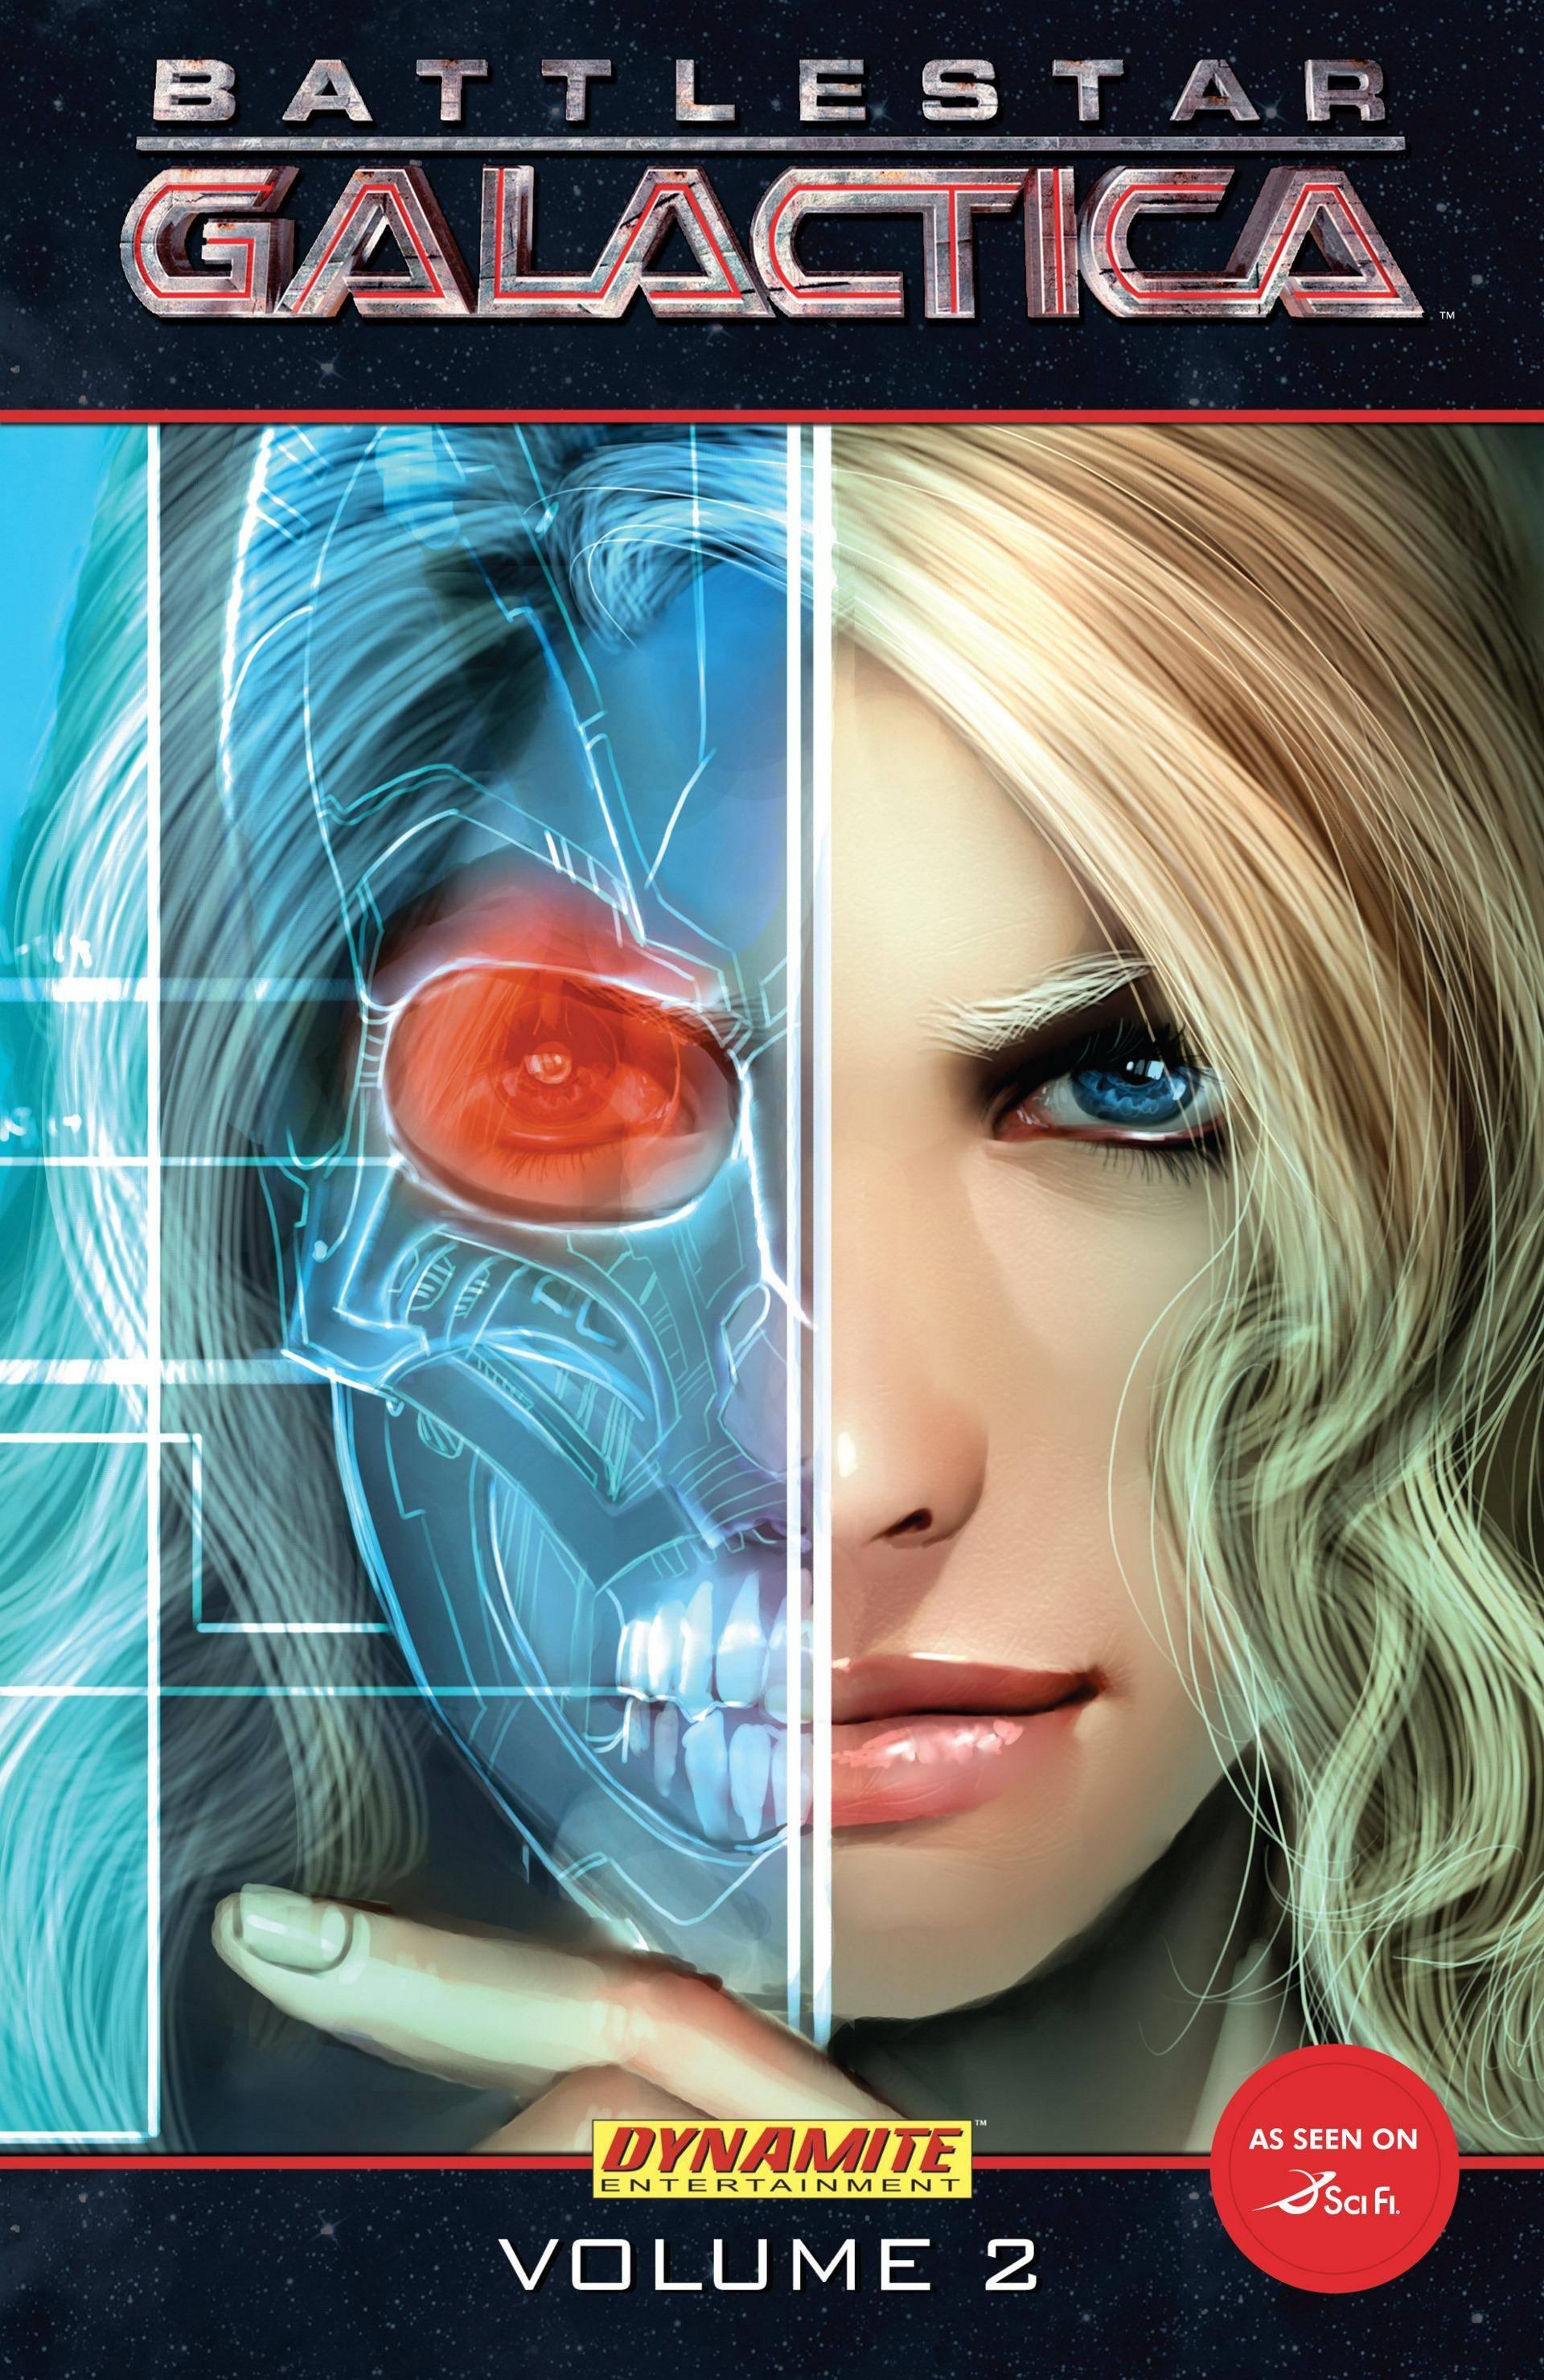 For DOM -  Battlestar Galactica Vol  2 TPB 2007 2 covers Digital Cypher-Empire cbr